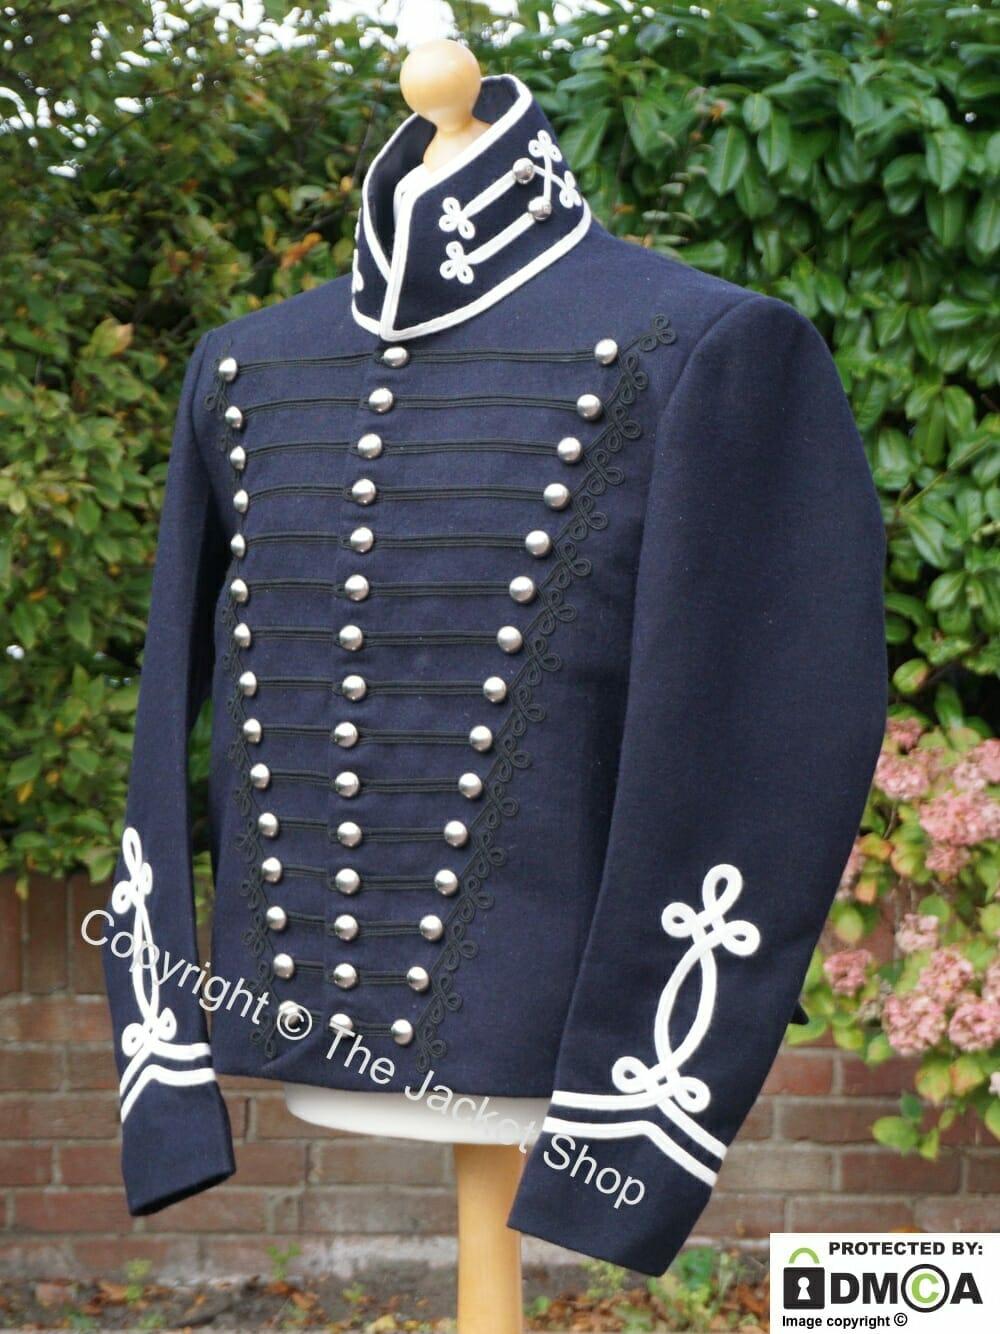 https://thejacketshop.co.uk/wp-content/uploads/2018/09/products-US-Dragoon-War-1812-uniform-buy.jpg